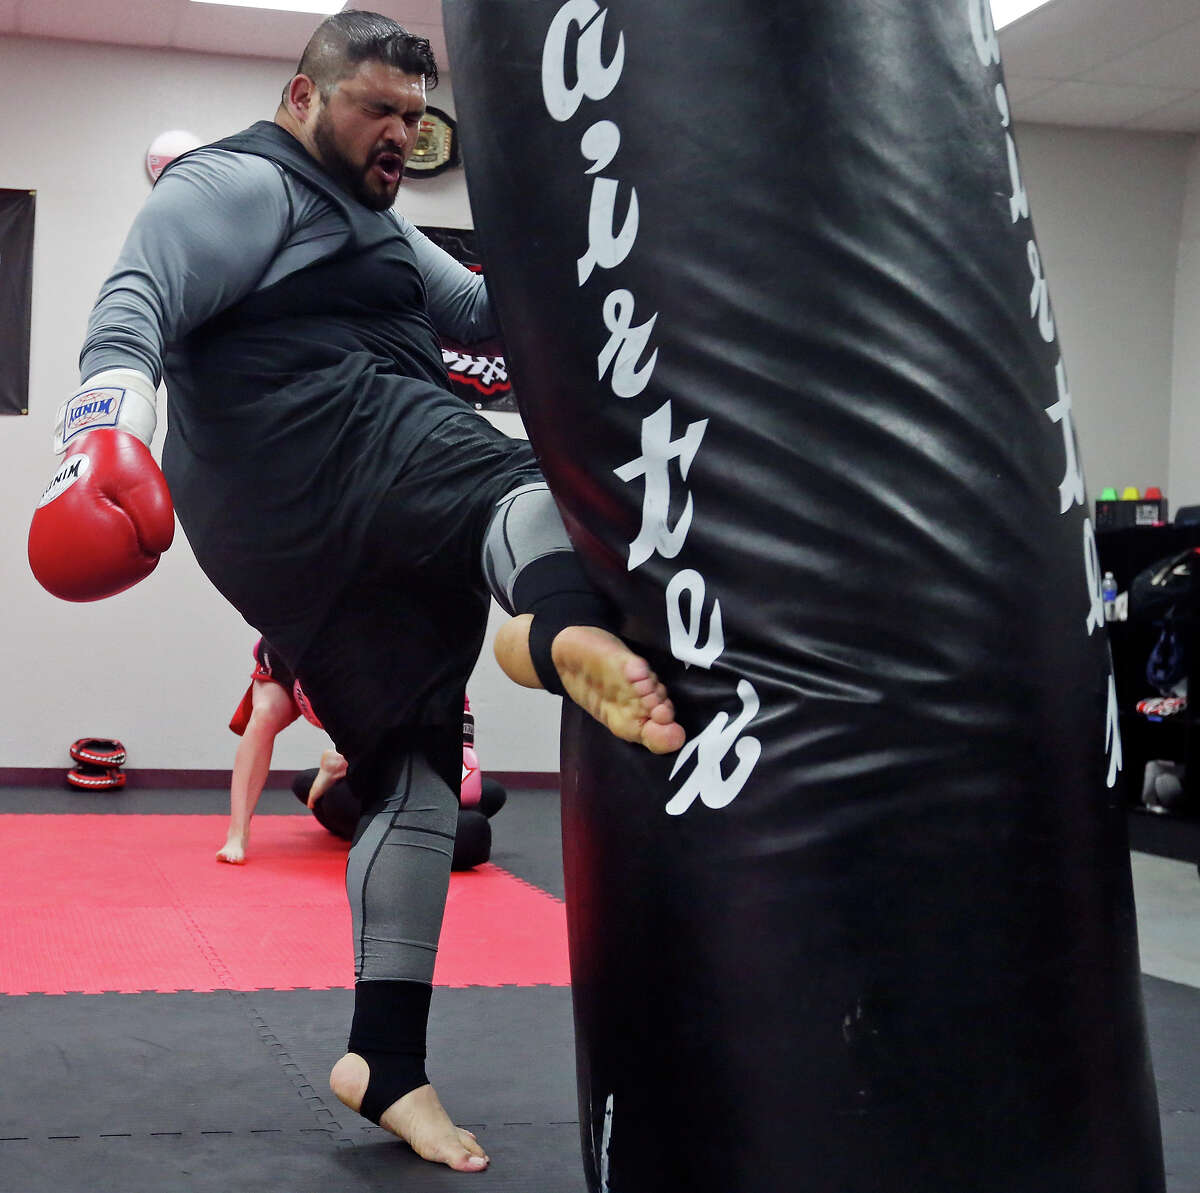 Robert Longoria, 31, kicks the heavy bag Monday April 6, 2015 during a Strike Fit class at Battle Tactics Academy.